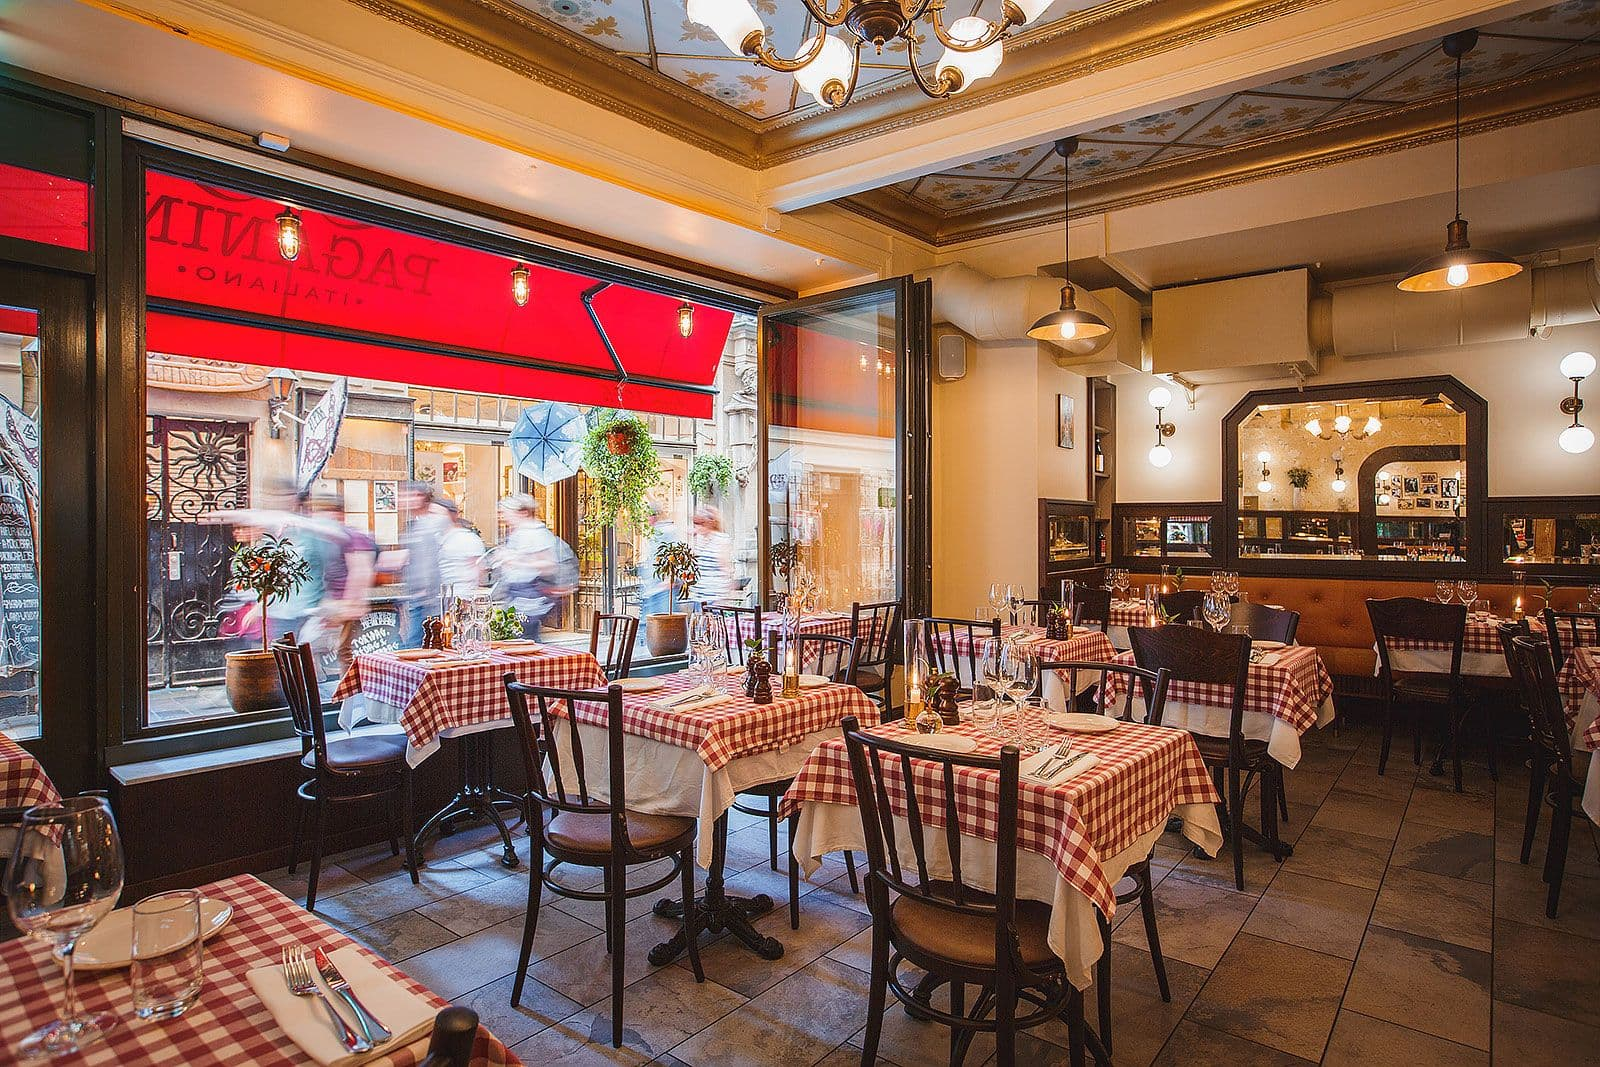 italiensk restaurang i gamla stan